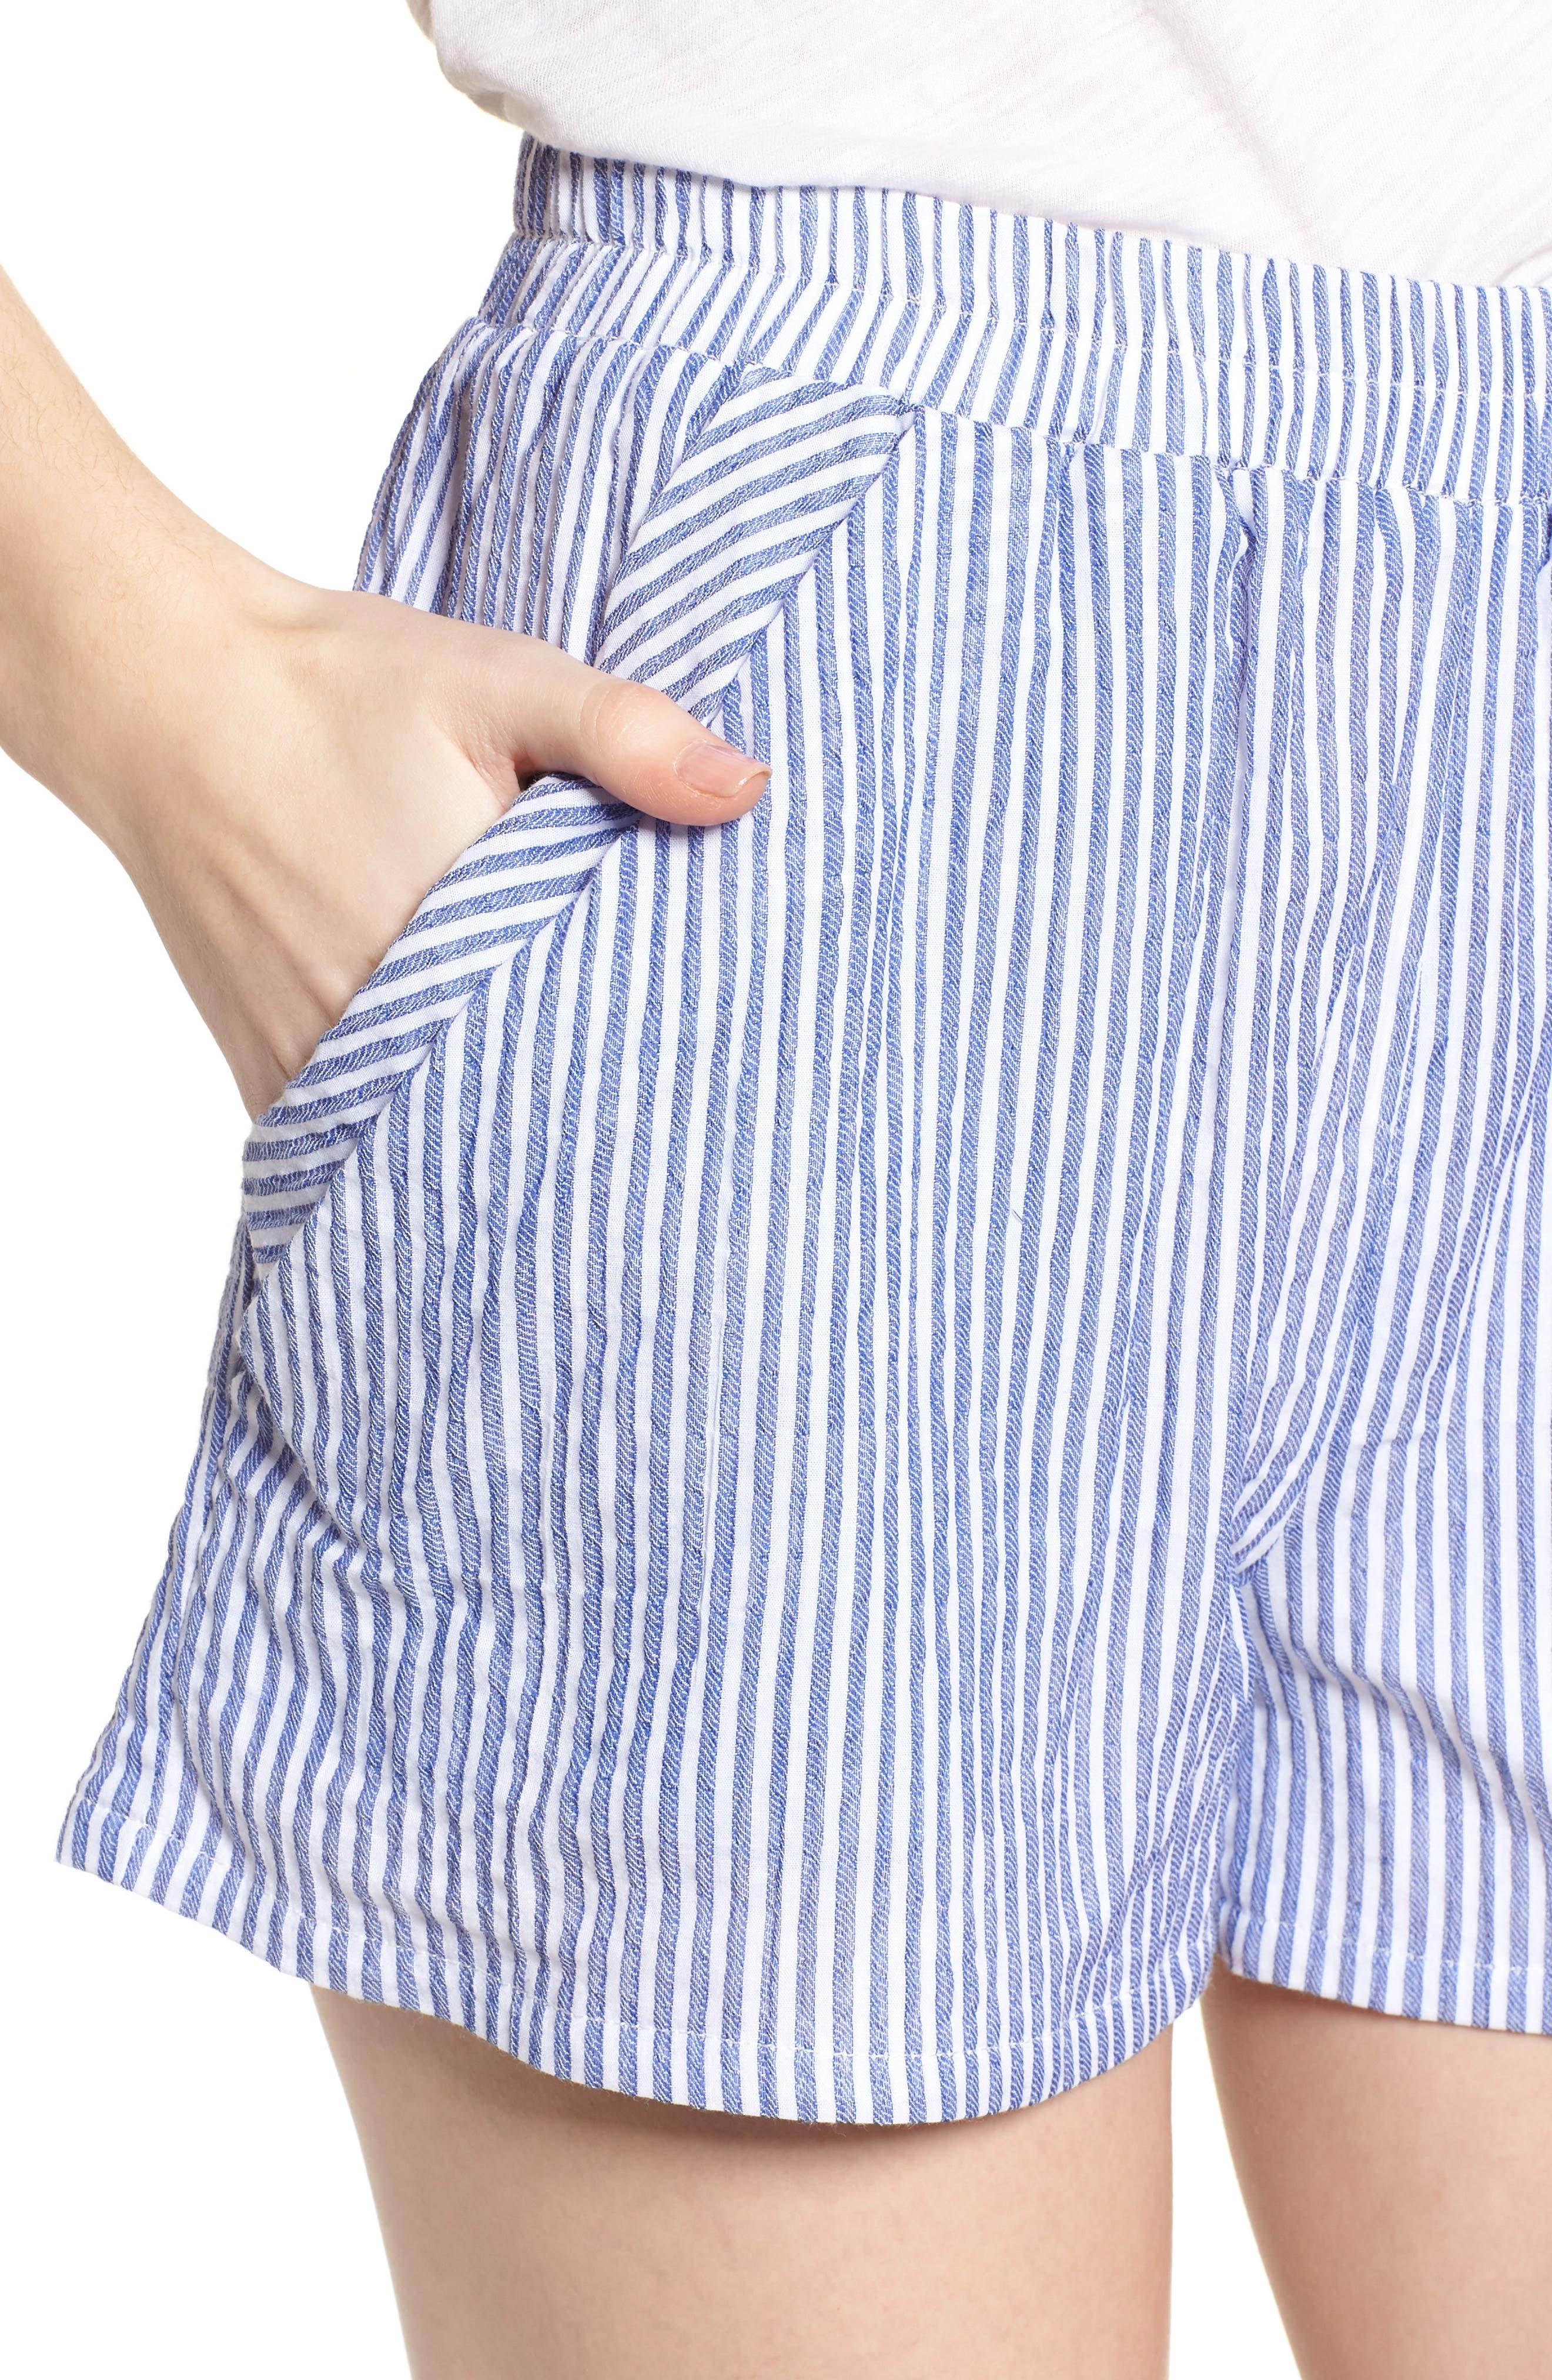 Bishop + Young Stripe Shorts,                             Alternate thumbnail 4, color,                             400